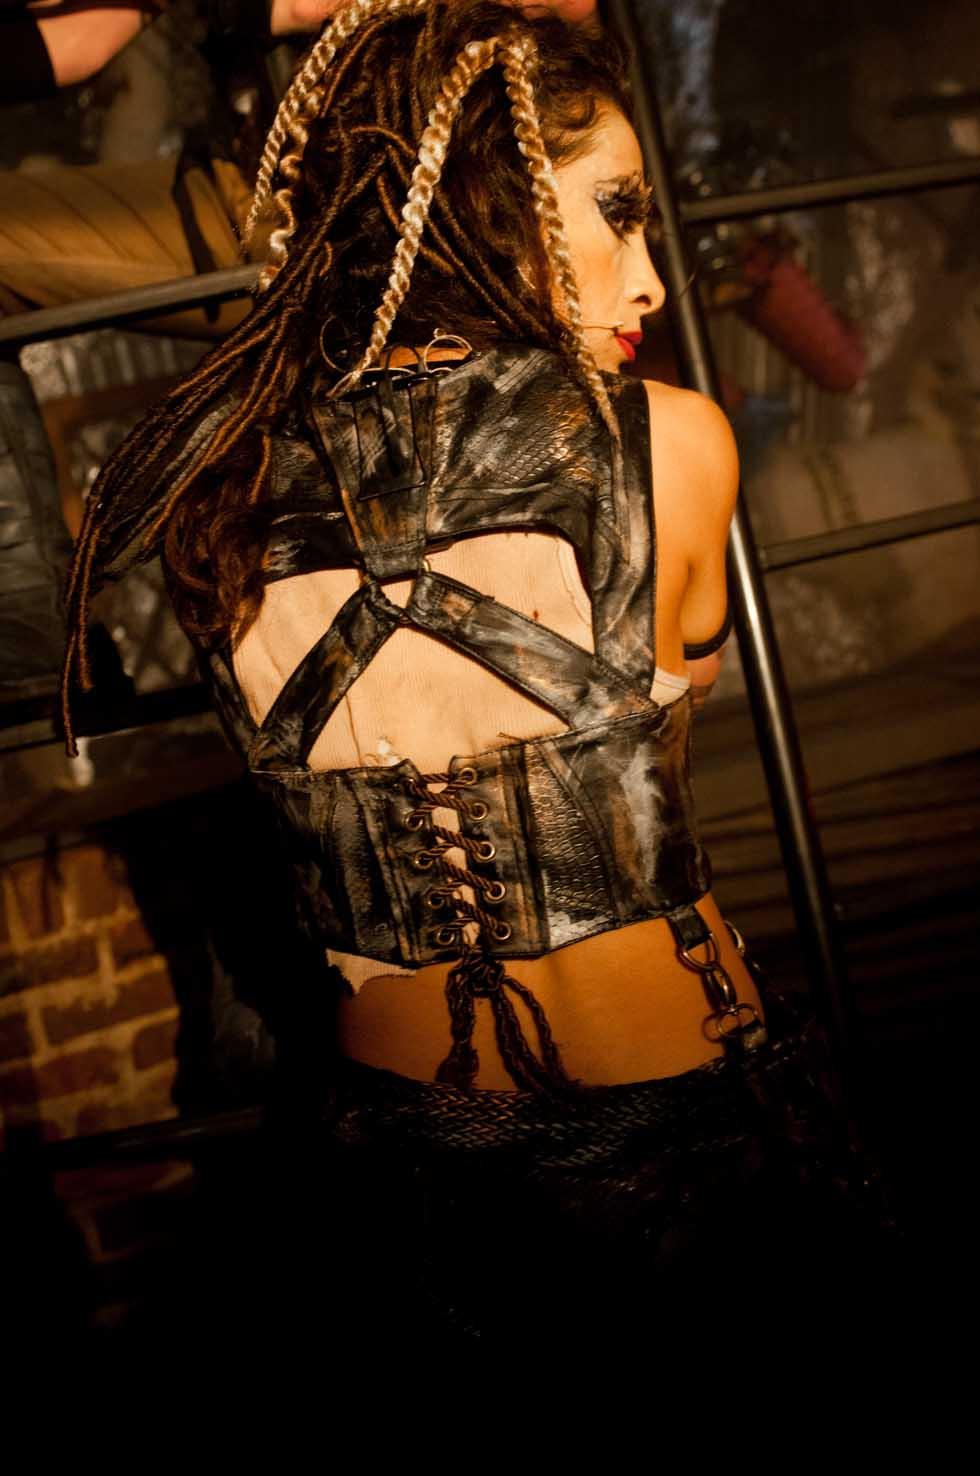 zum-schneider-nyc-2012-karneval-apocalyptika-4372.jpg